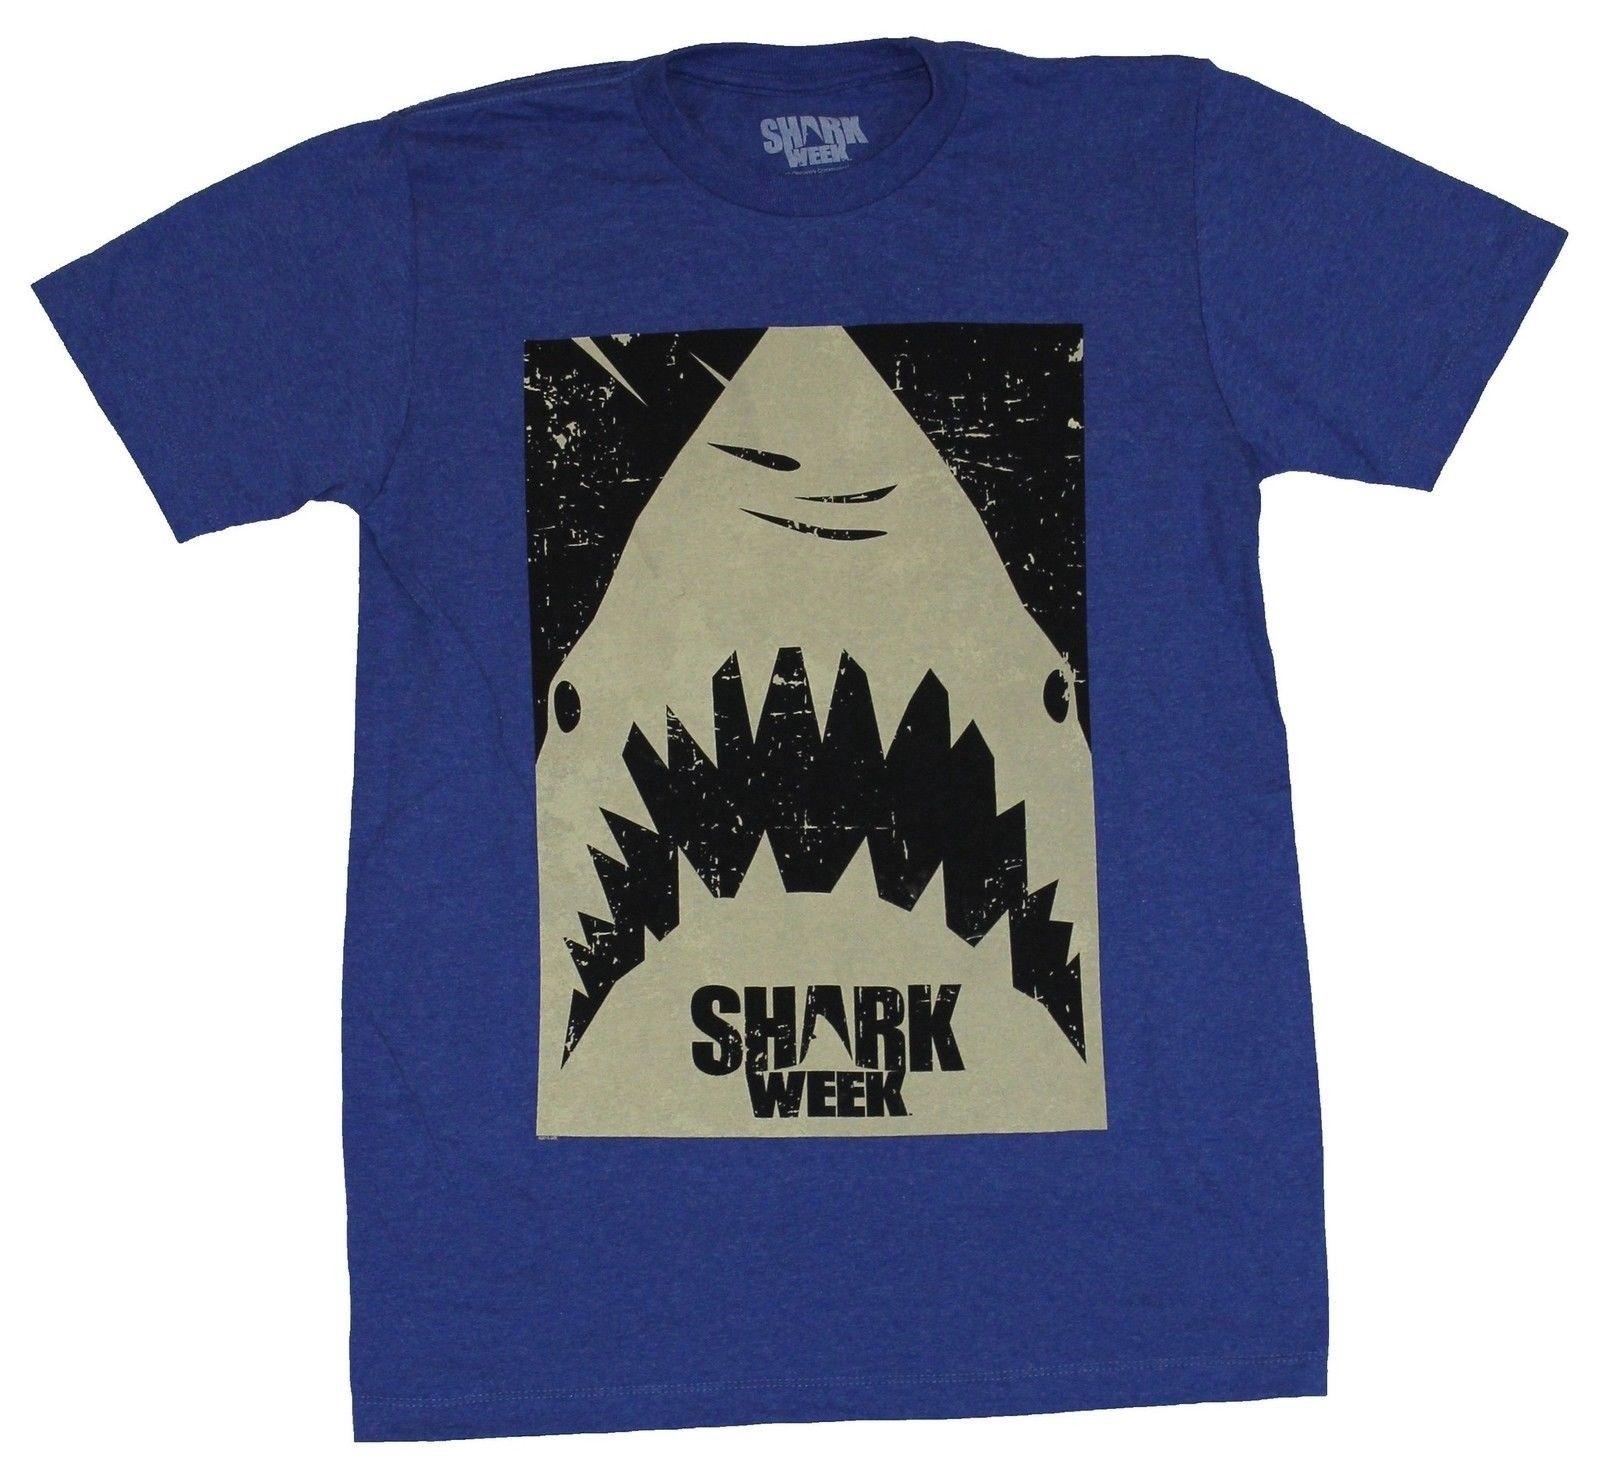 New Shark Week Couch Potato Funwear T-shirt Great White Beach Alert Summer Tshirt Hot New Fashion Free Shipping 2018 Shirts T-shirts